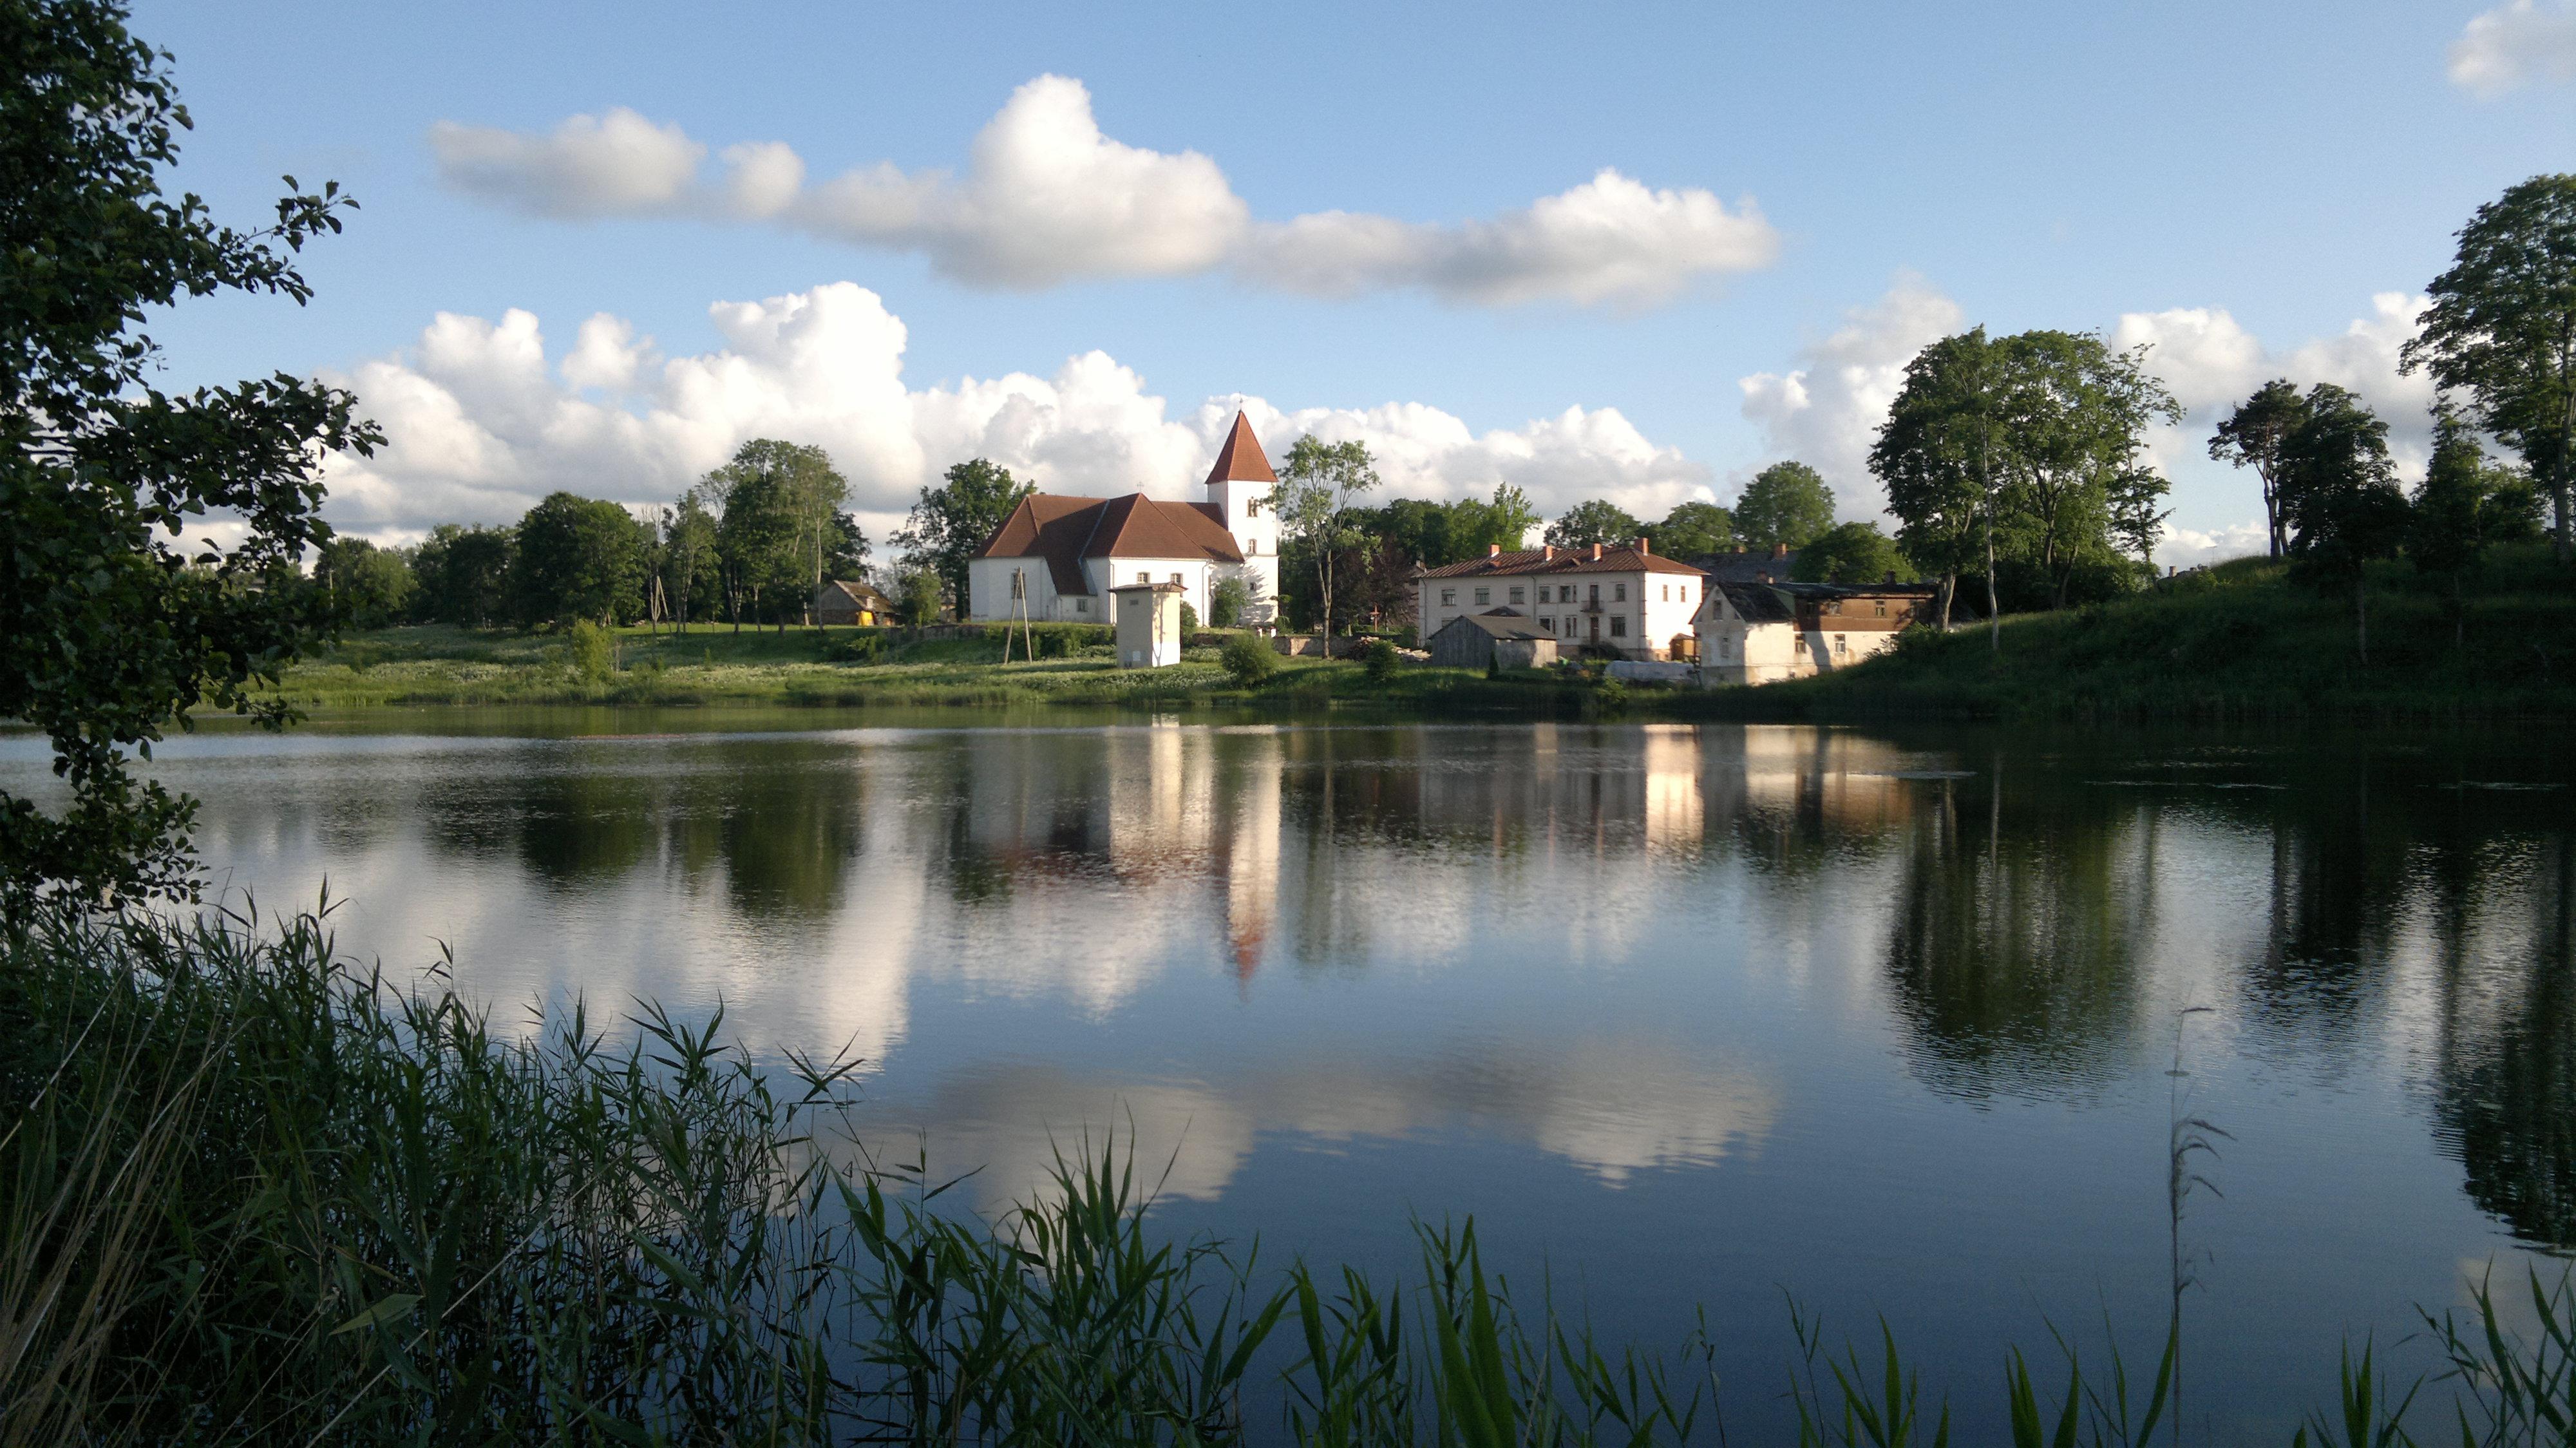 File One Of My Most Beautiful Places In The World Alsunga Viena No Man M Visskaist Kaj M